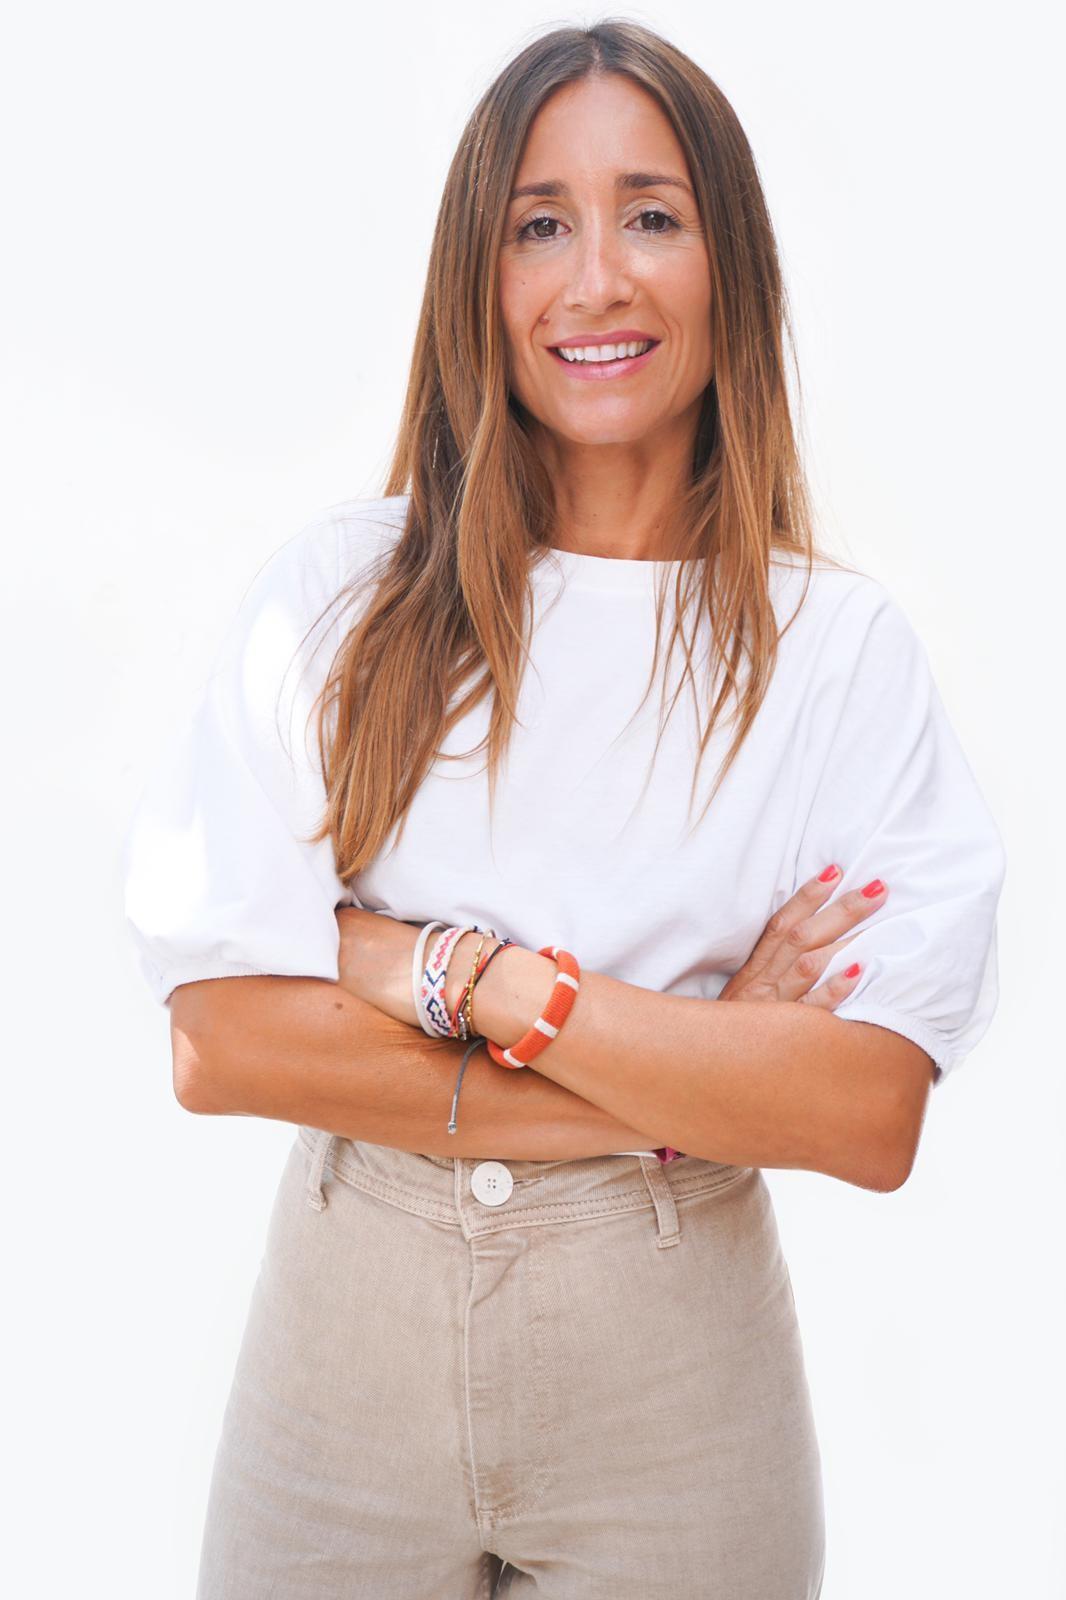 Maria Medina Maldonado